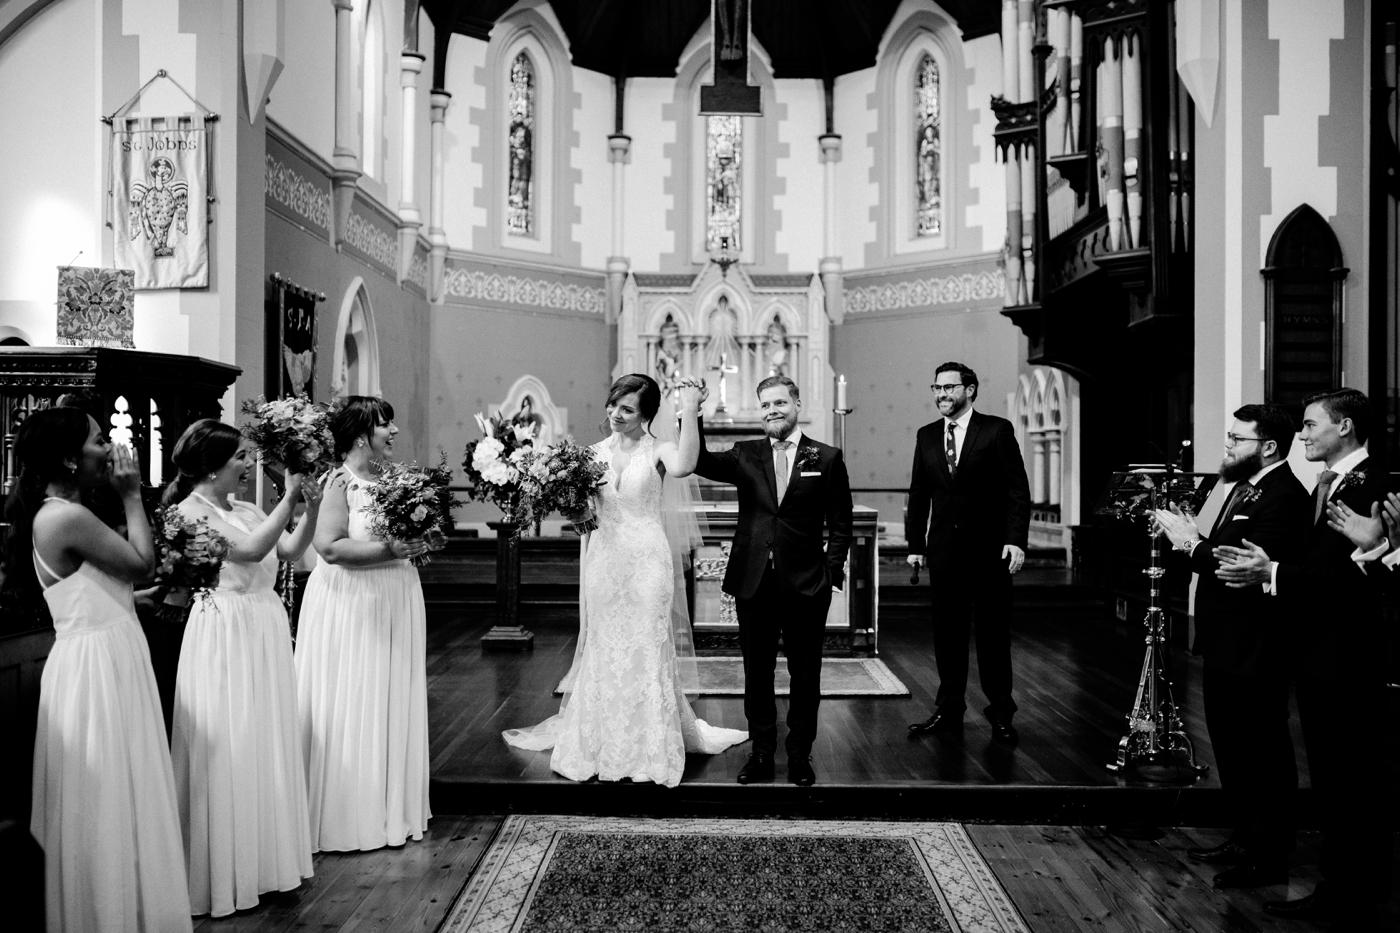 Erin & Ryan - Natural Wedding Photographer in Adelaide - Maximillians Wedding - Simple and Modern Wedding Photographer - Katherine Schultz - www.katherineschultzphotography.com_0026.jpg